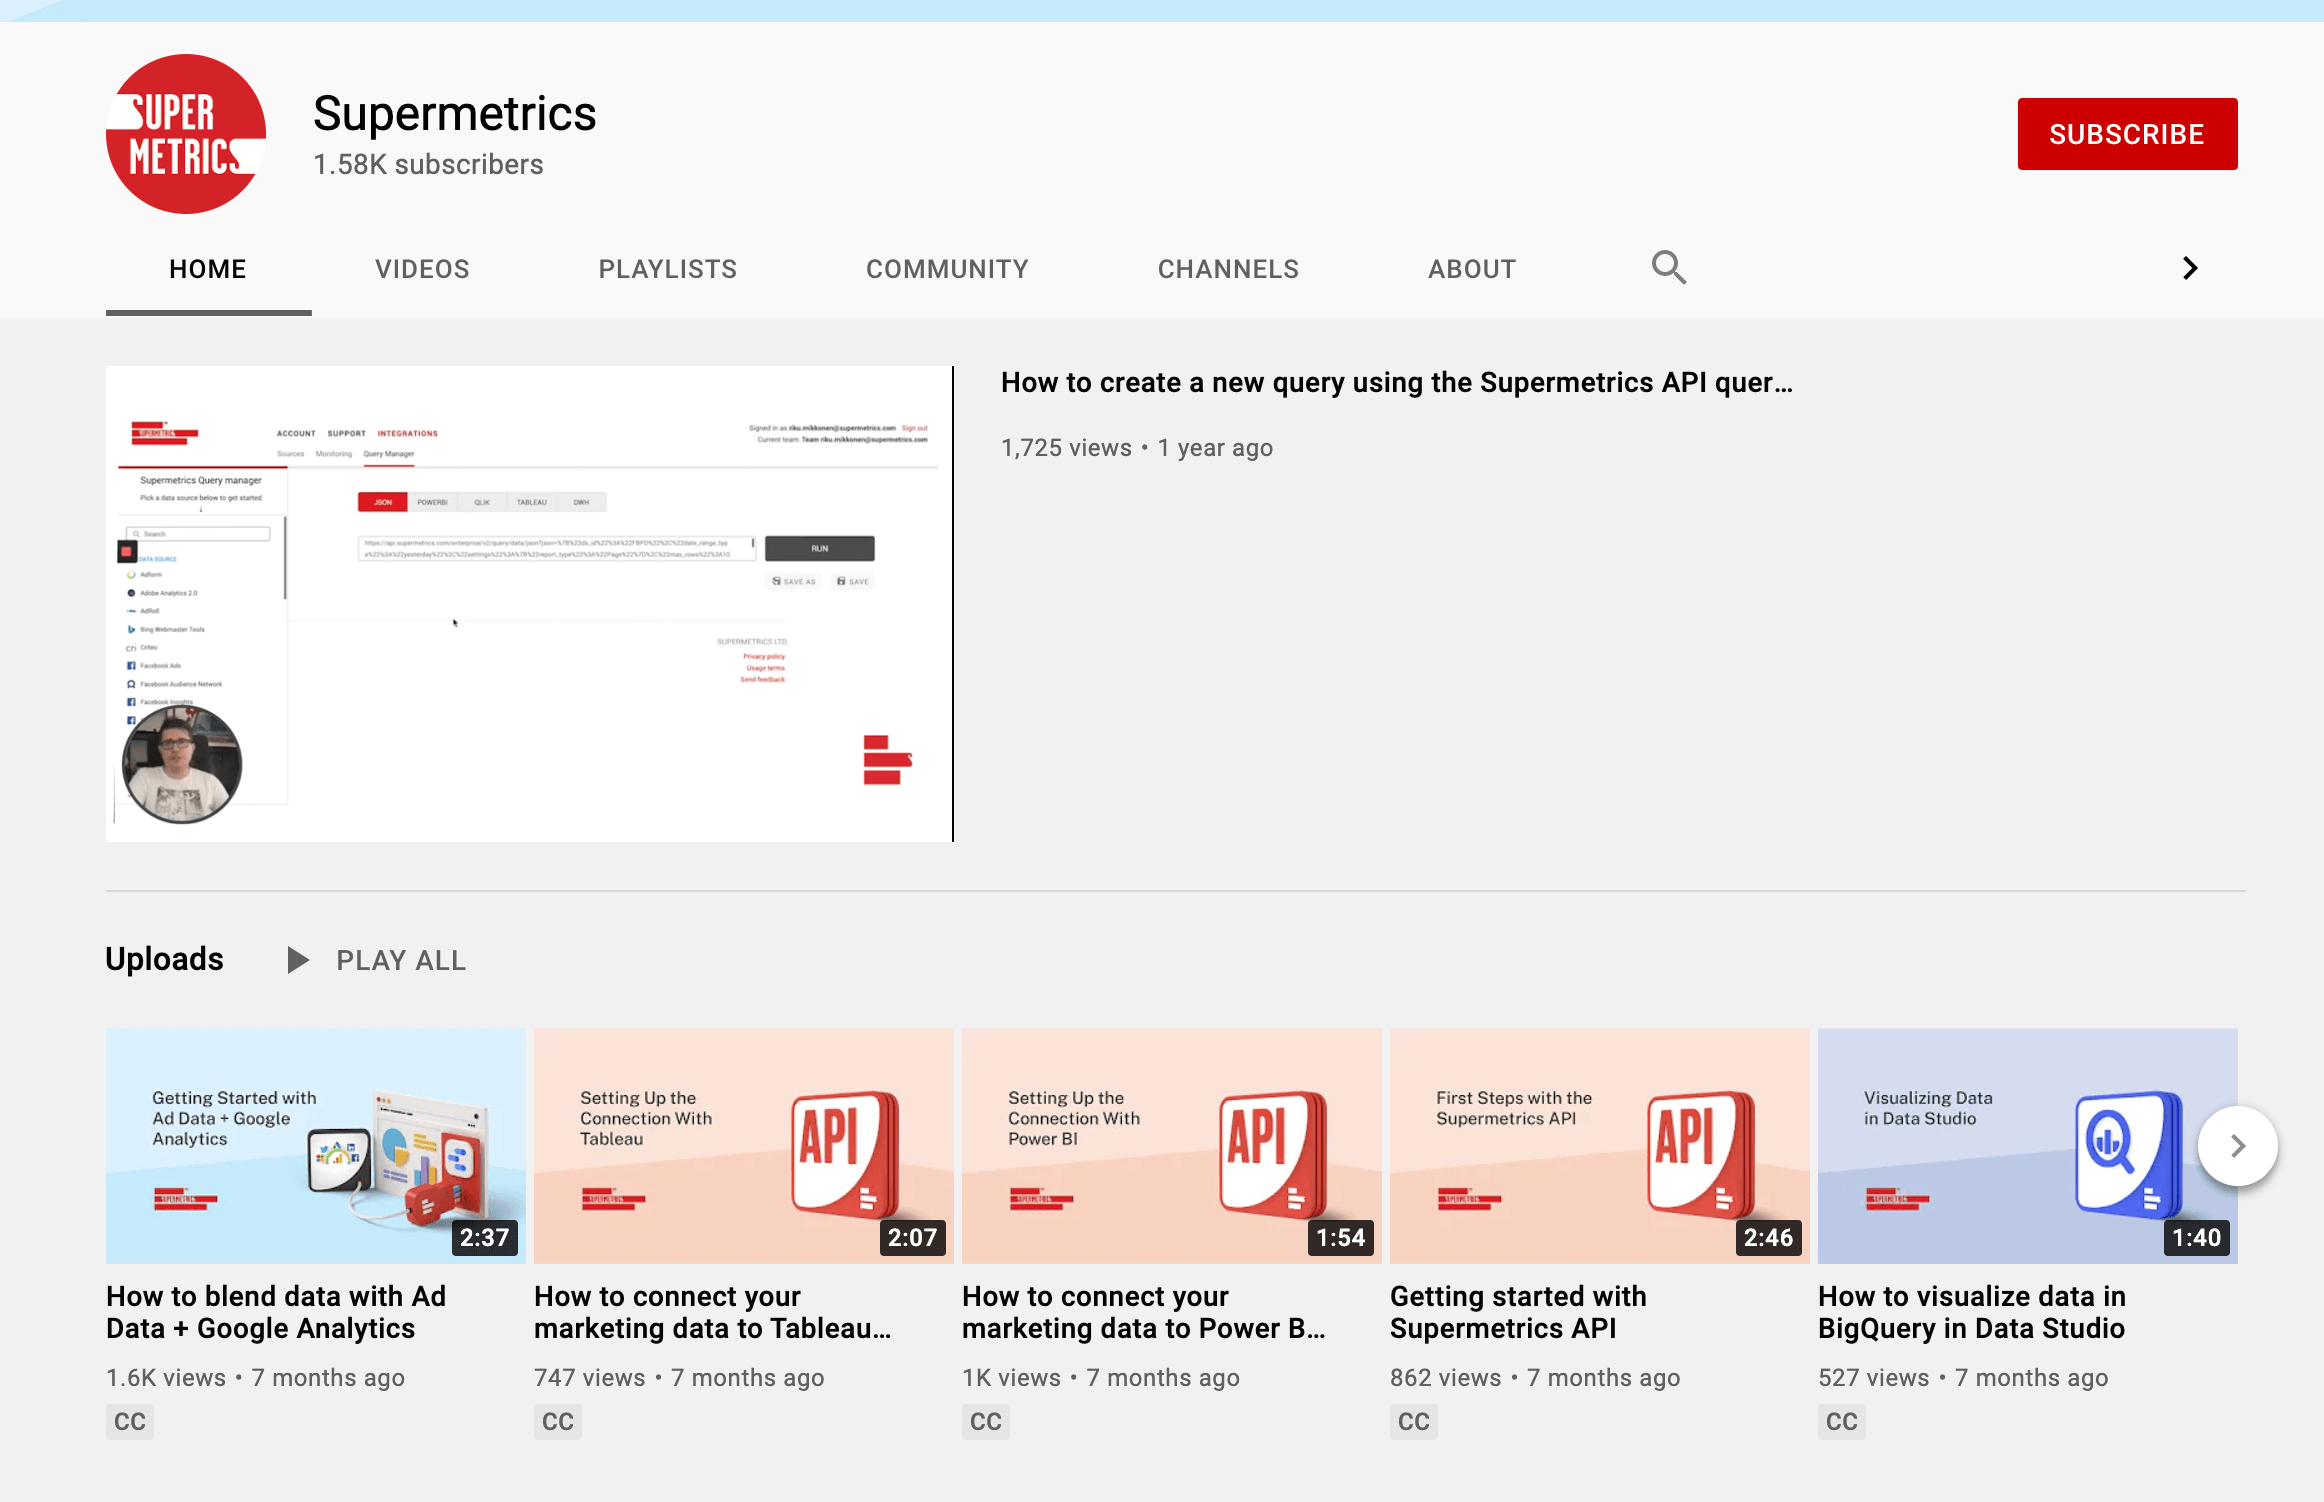 Supermetrics YouTube Channel